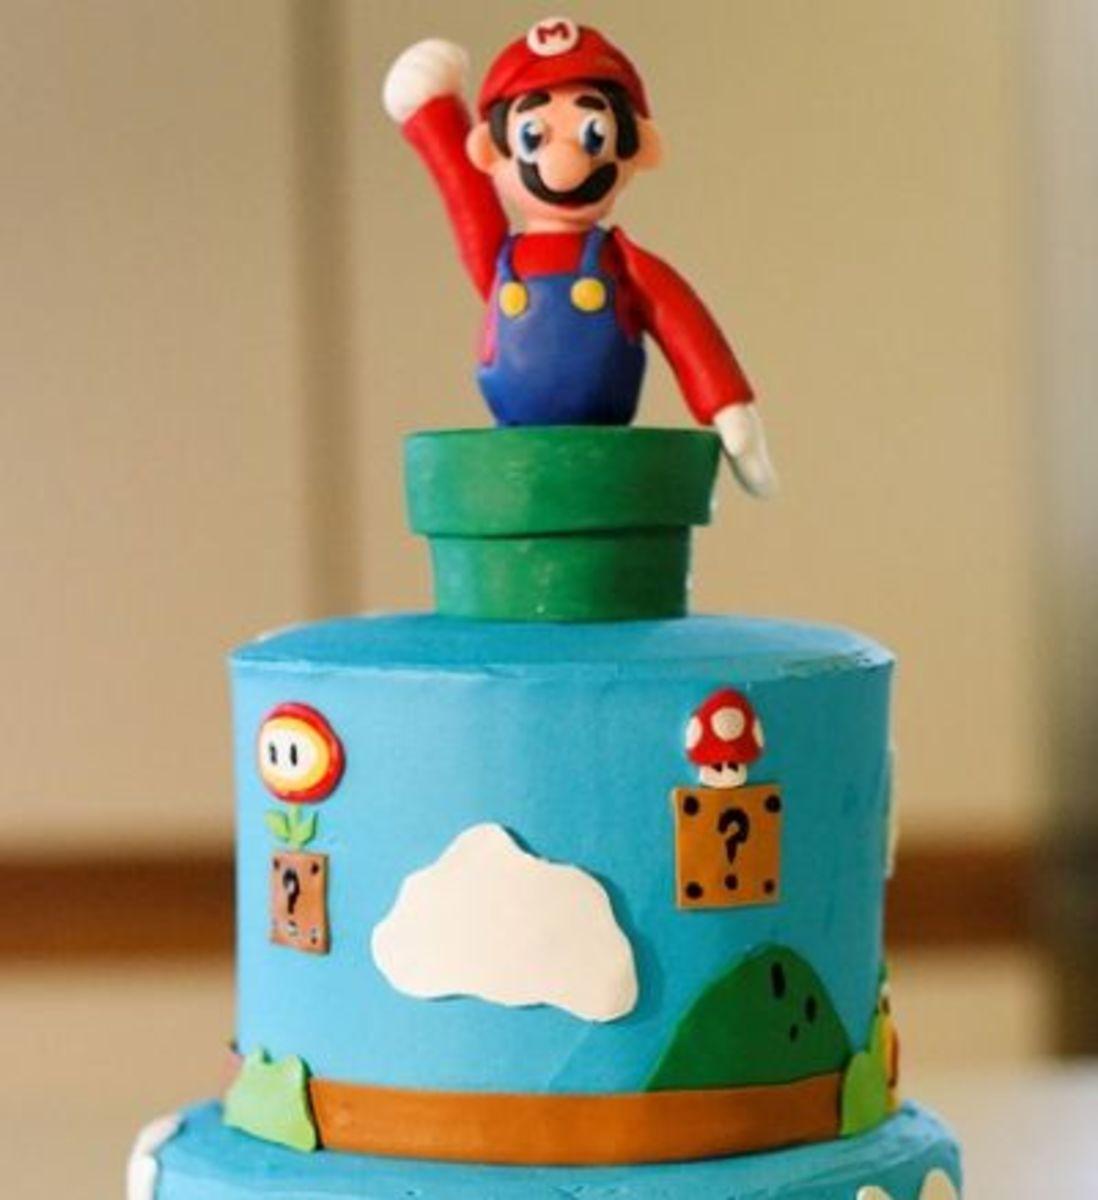 Awesome Mario Cake!